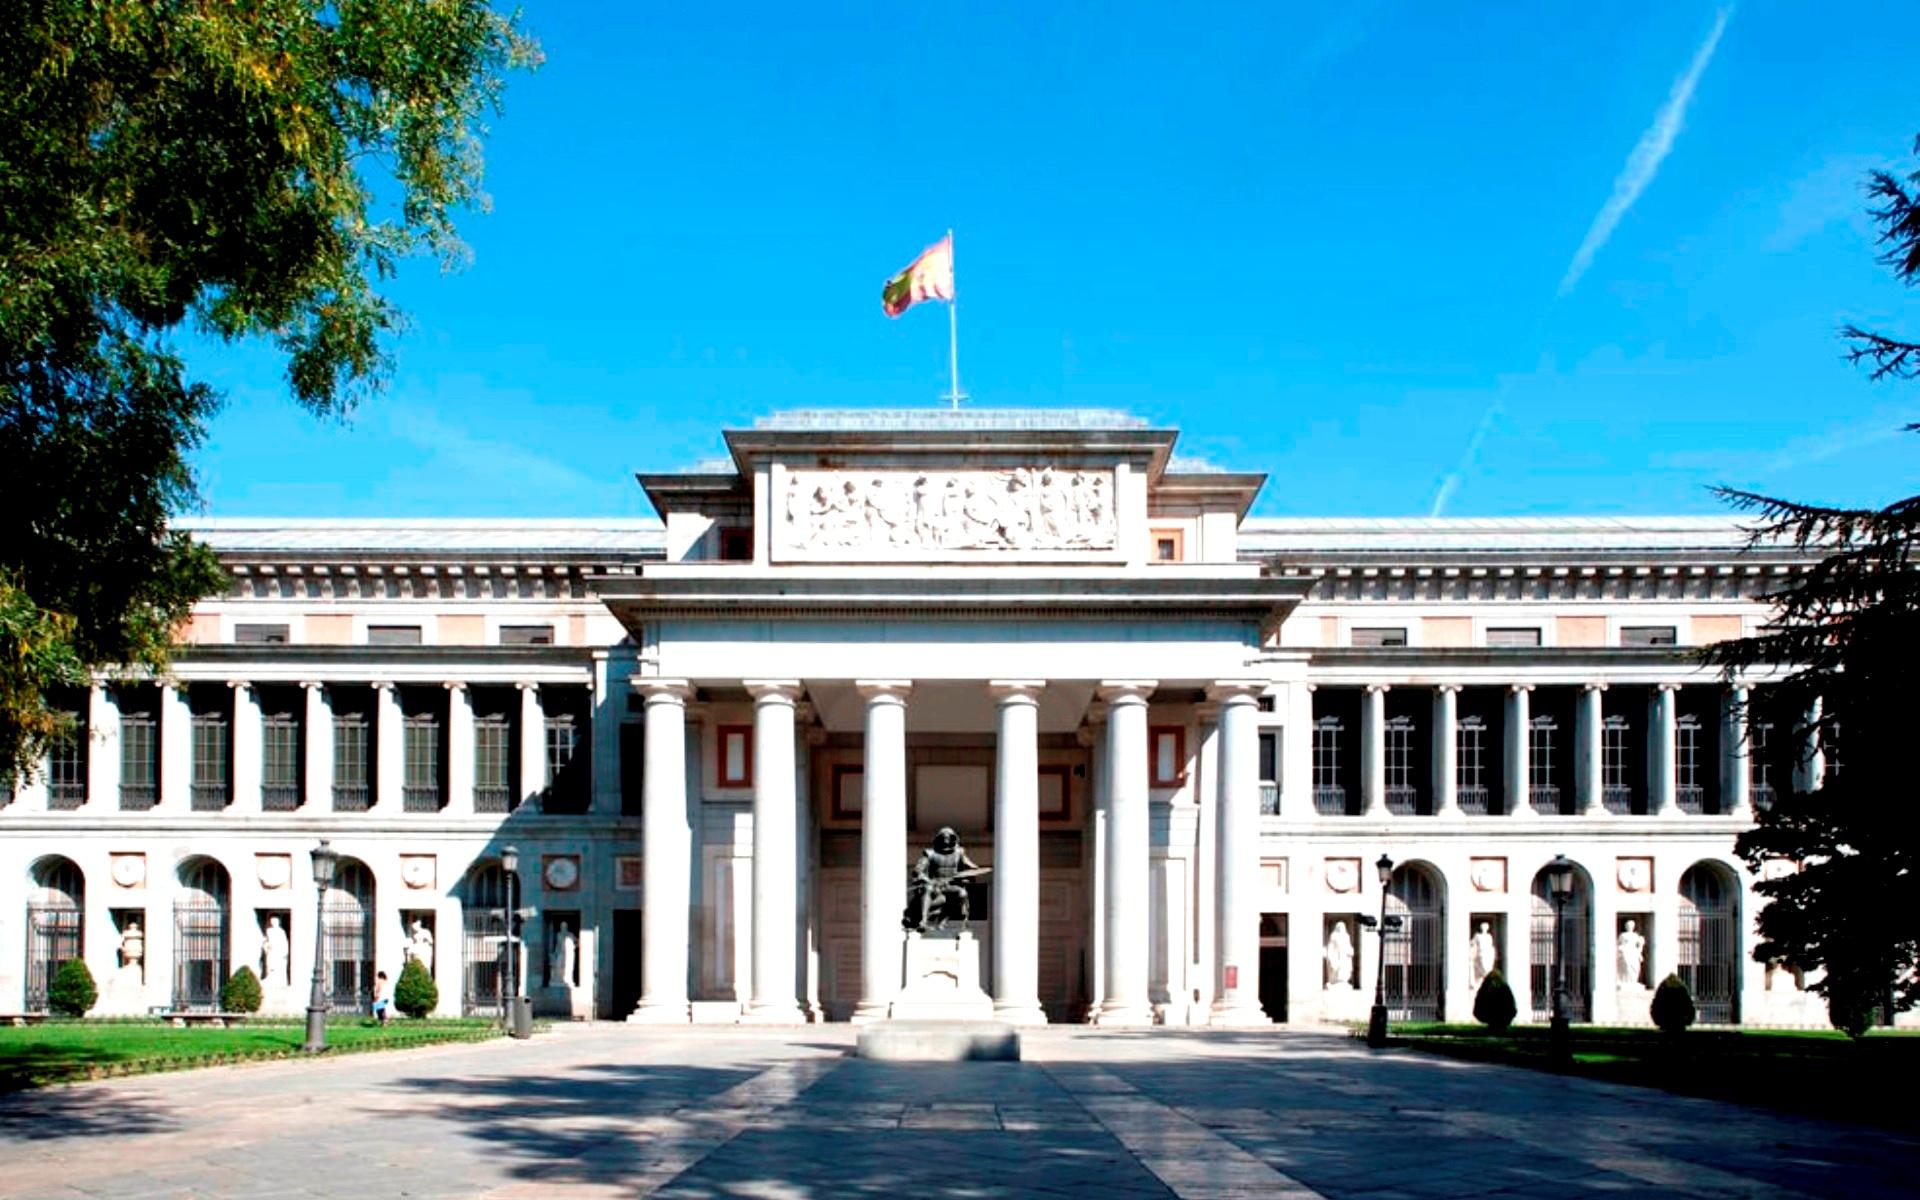 Картинка Музей Прадо в Мадриде » Музеи ...: www.kartinki24.ru/kartinki/muzei/19544.html